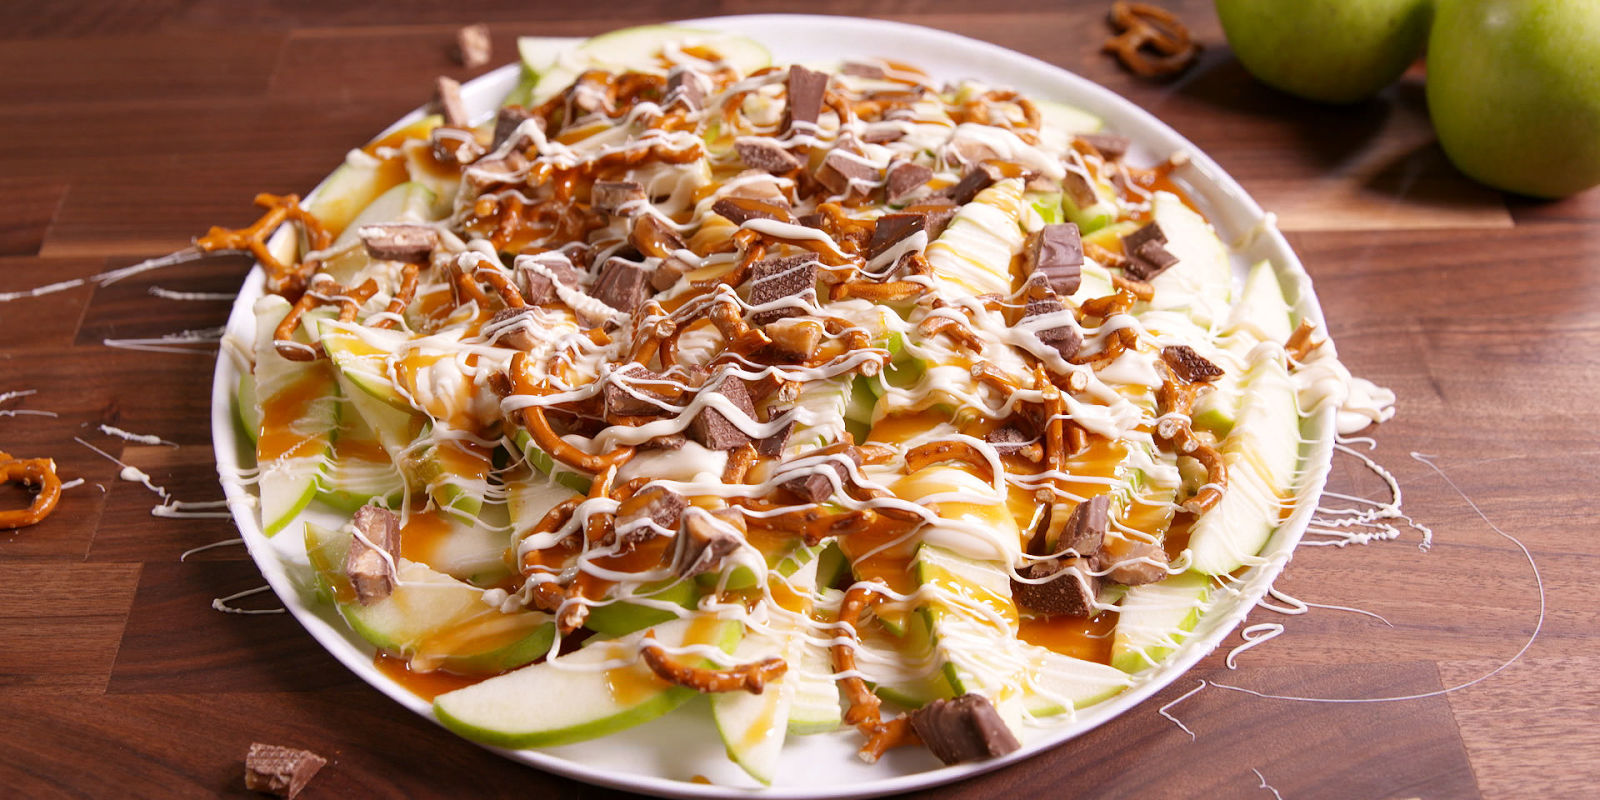 Lindsay Funston Best Apple Nachos Recipe How To Make Apple Nachos